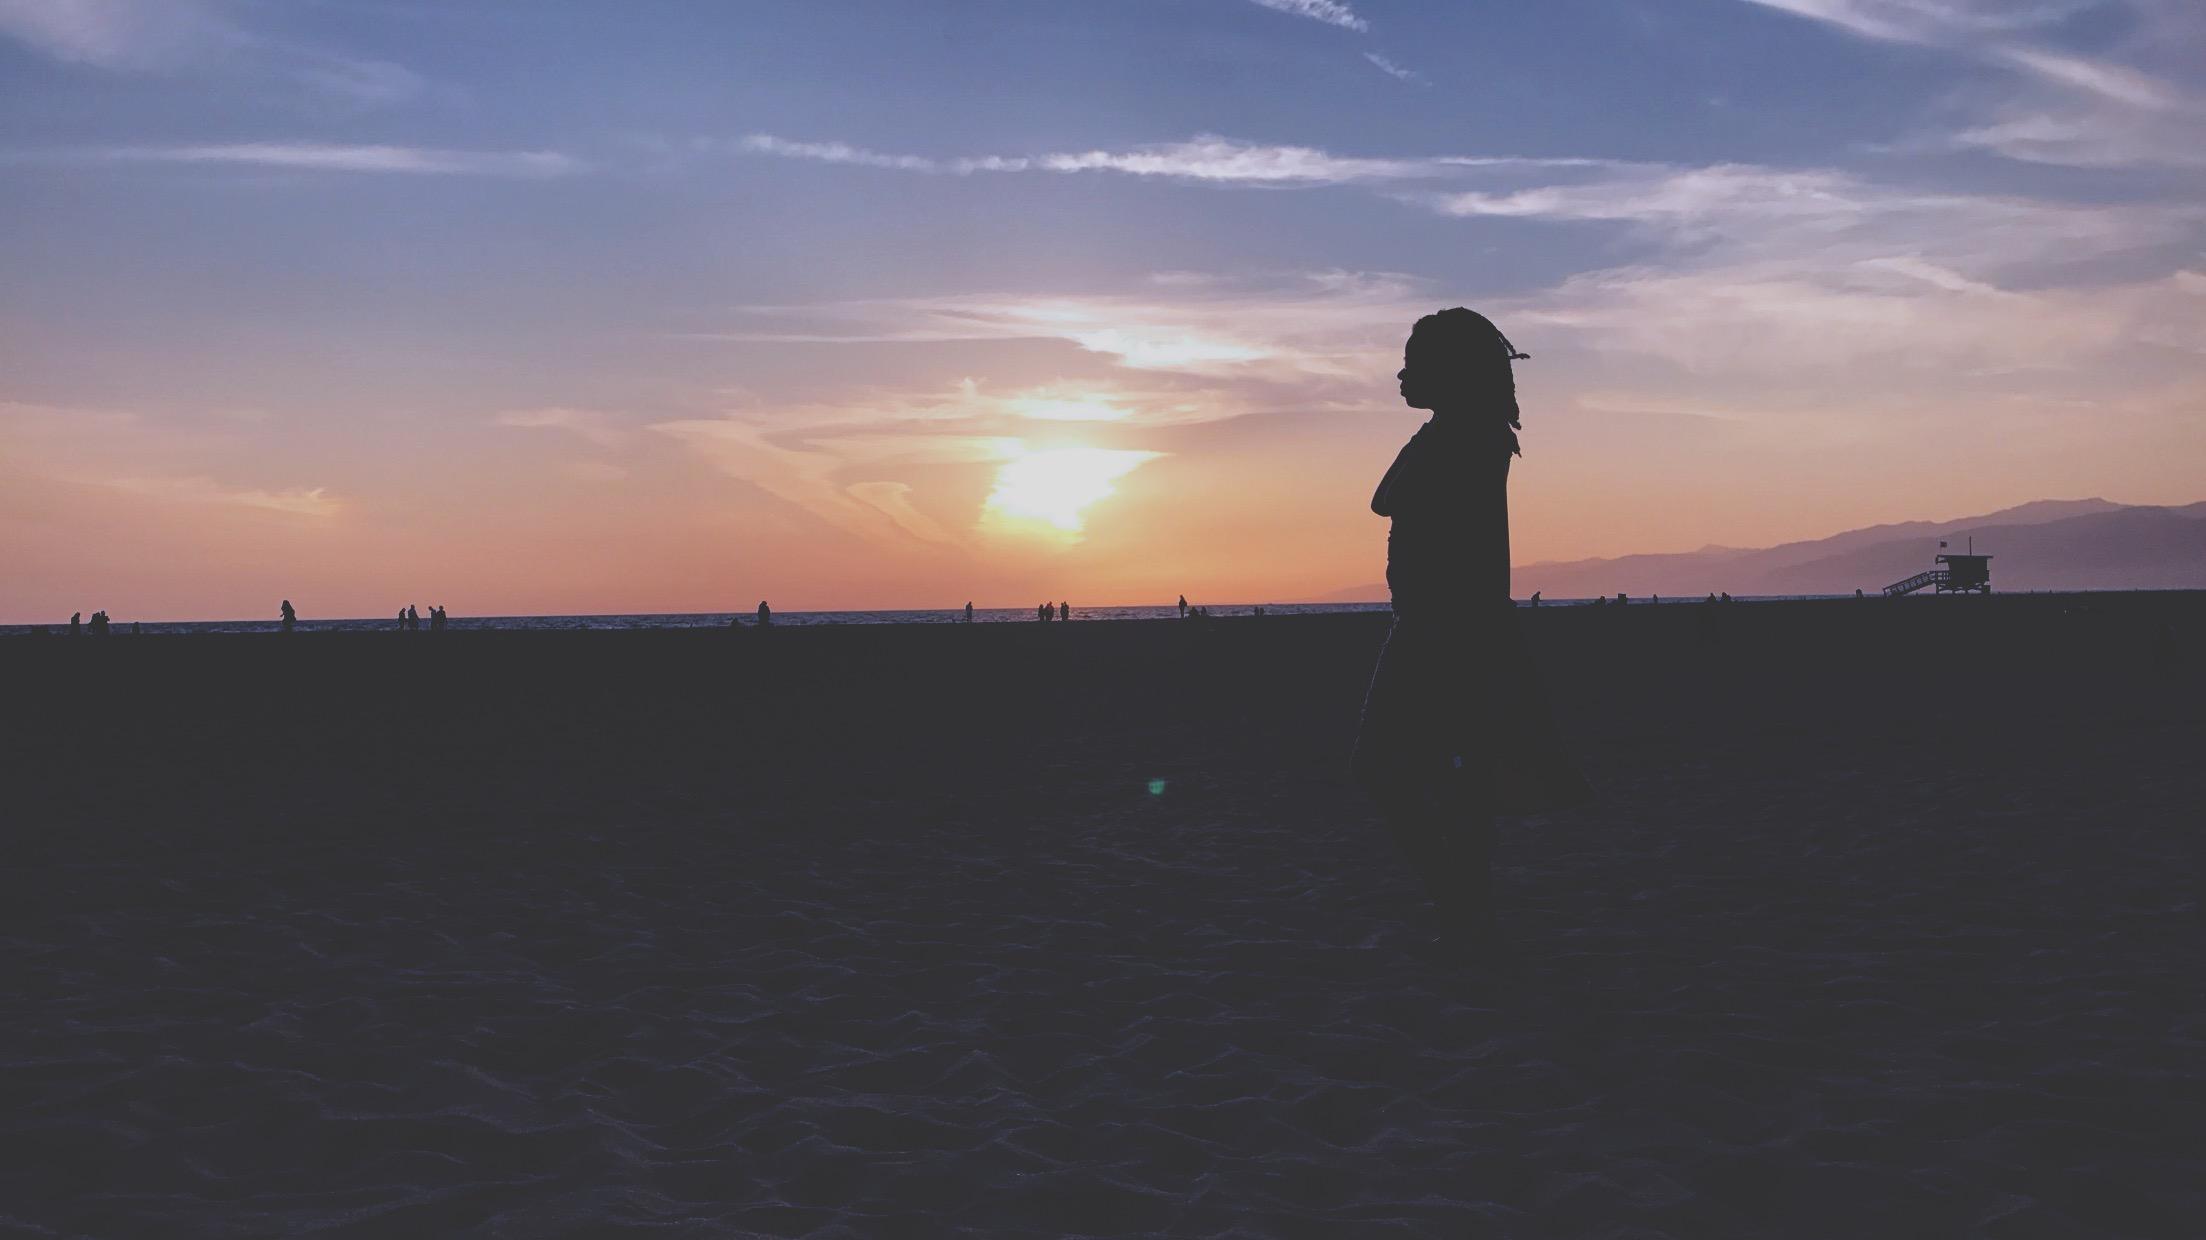 Venice Beach, California '17